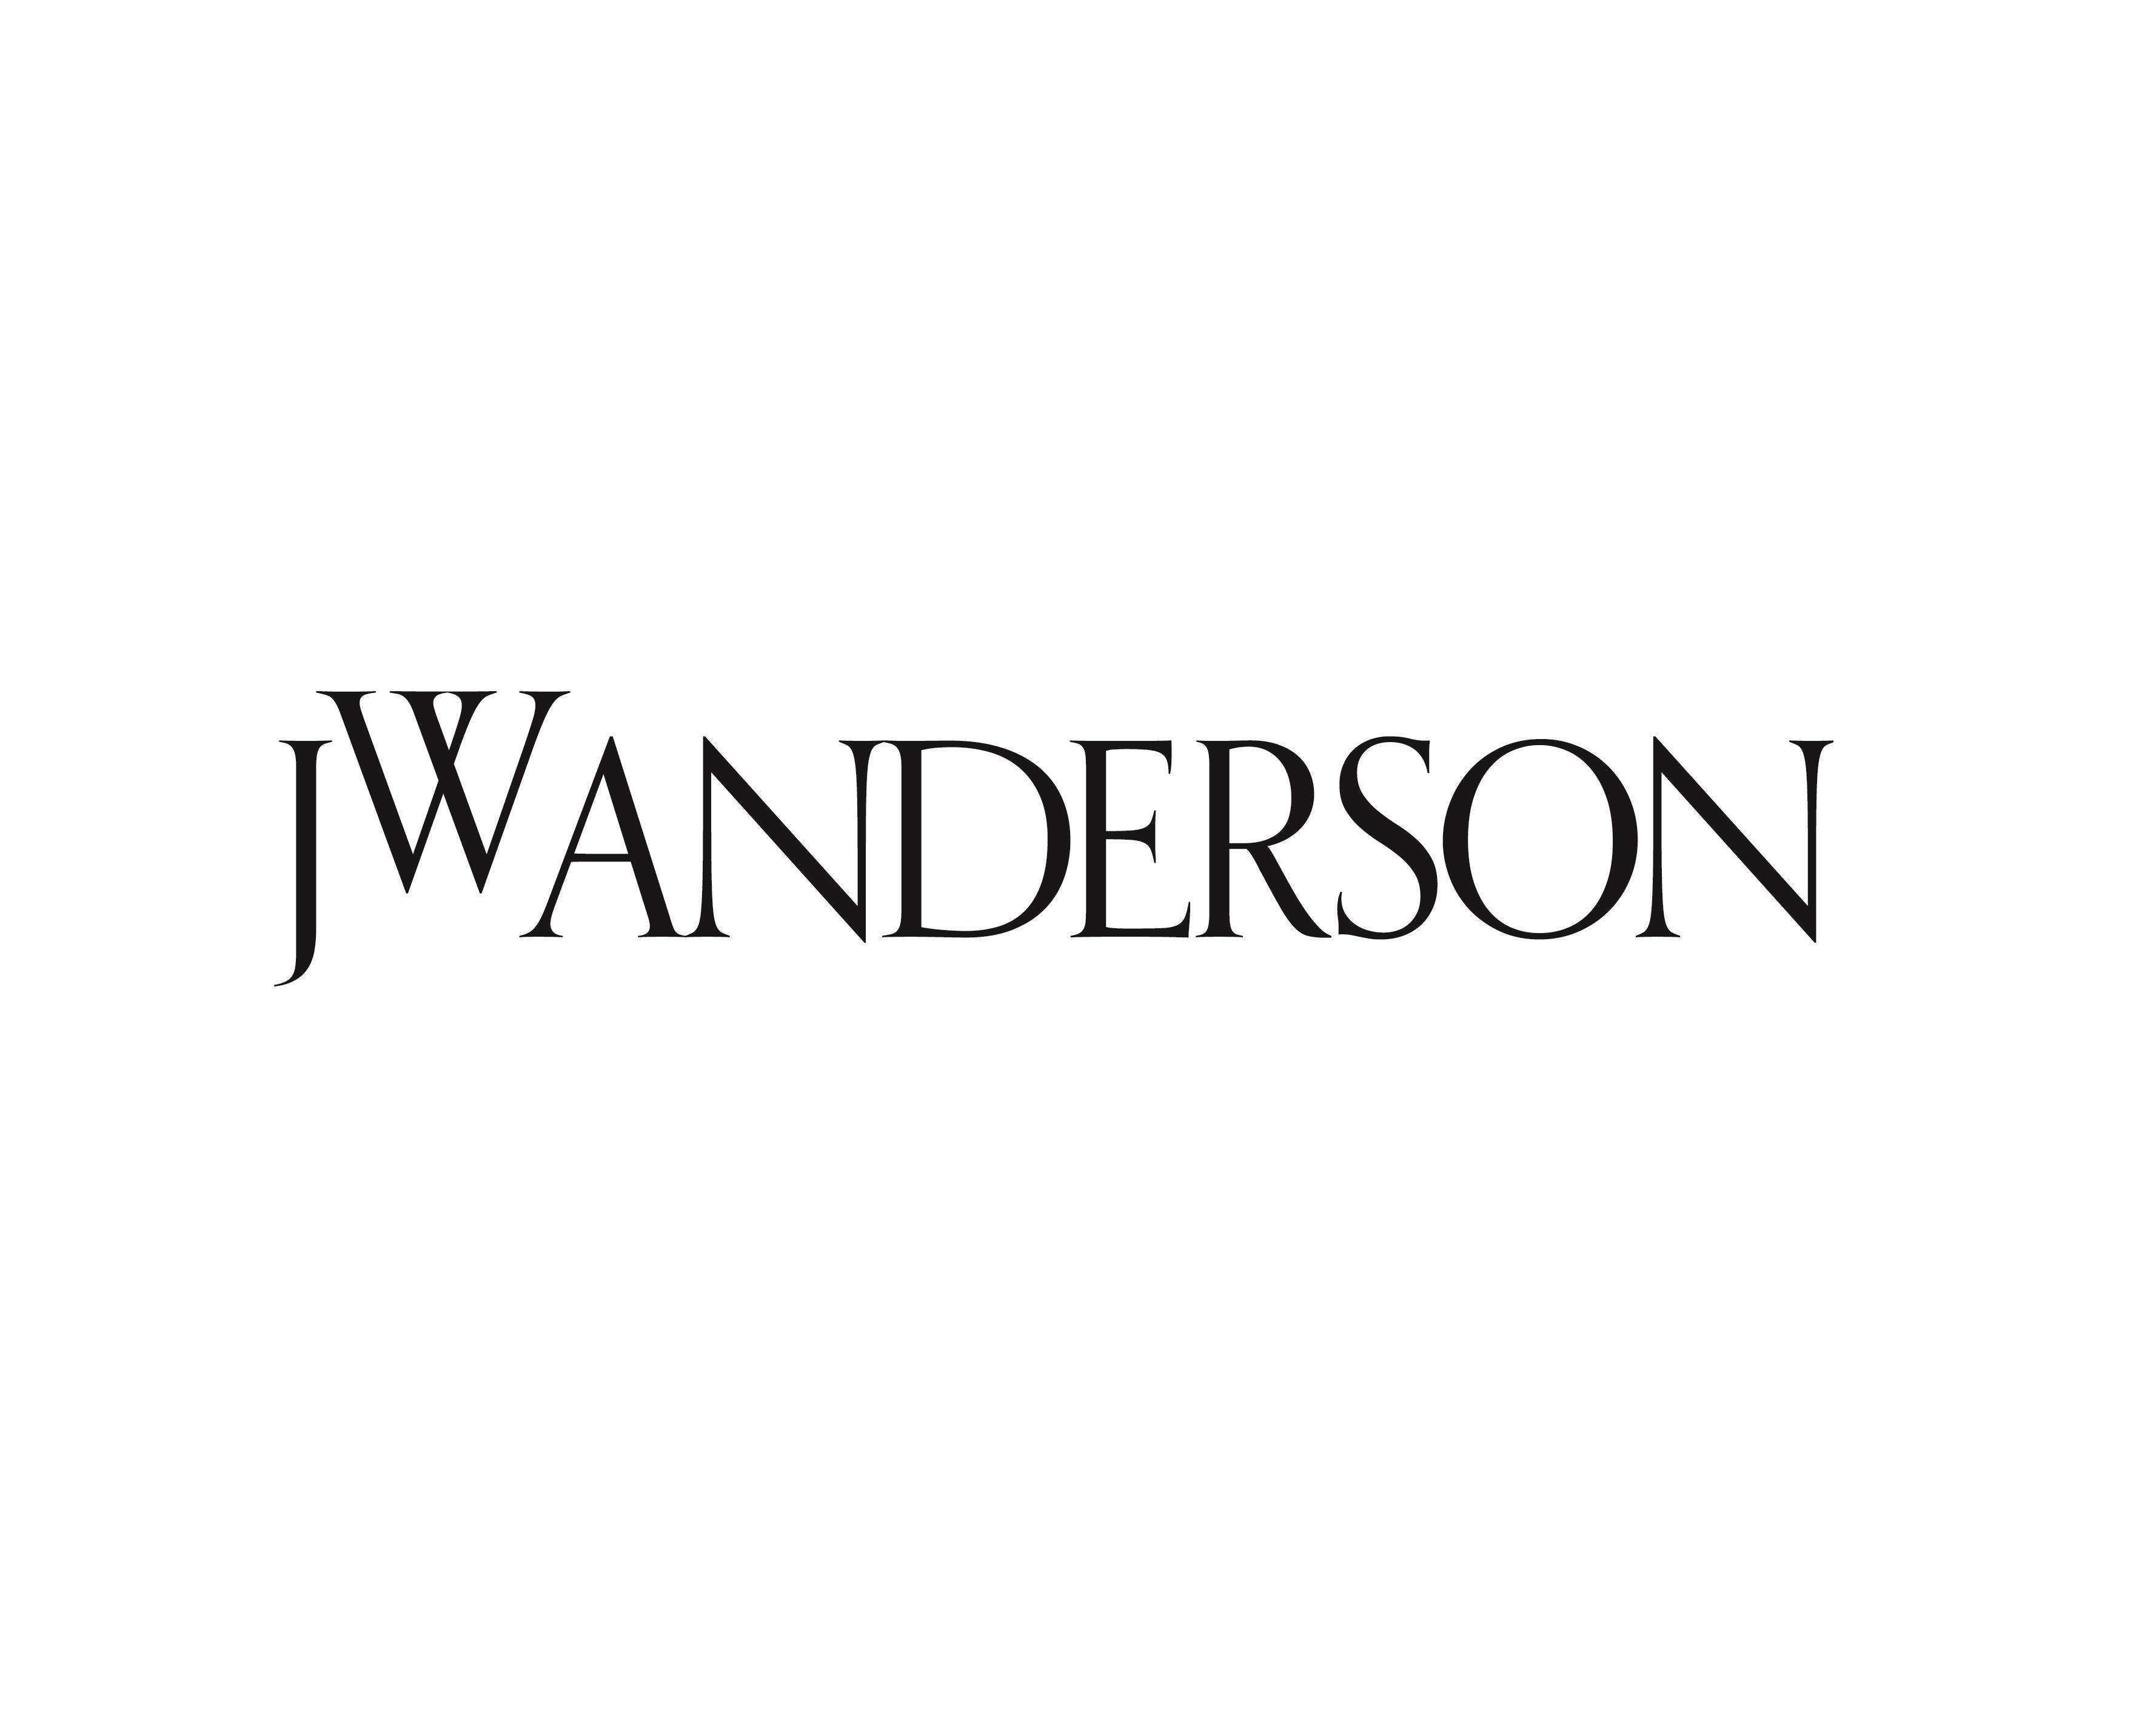 J.W.Anderson company logo